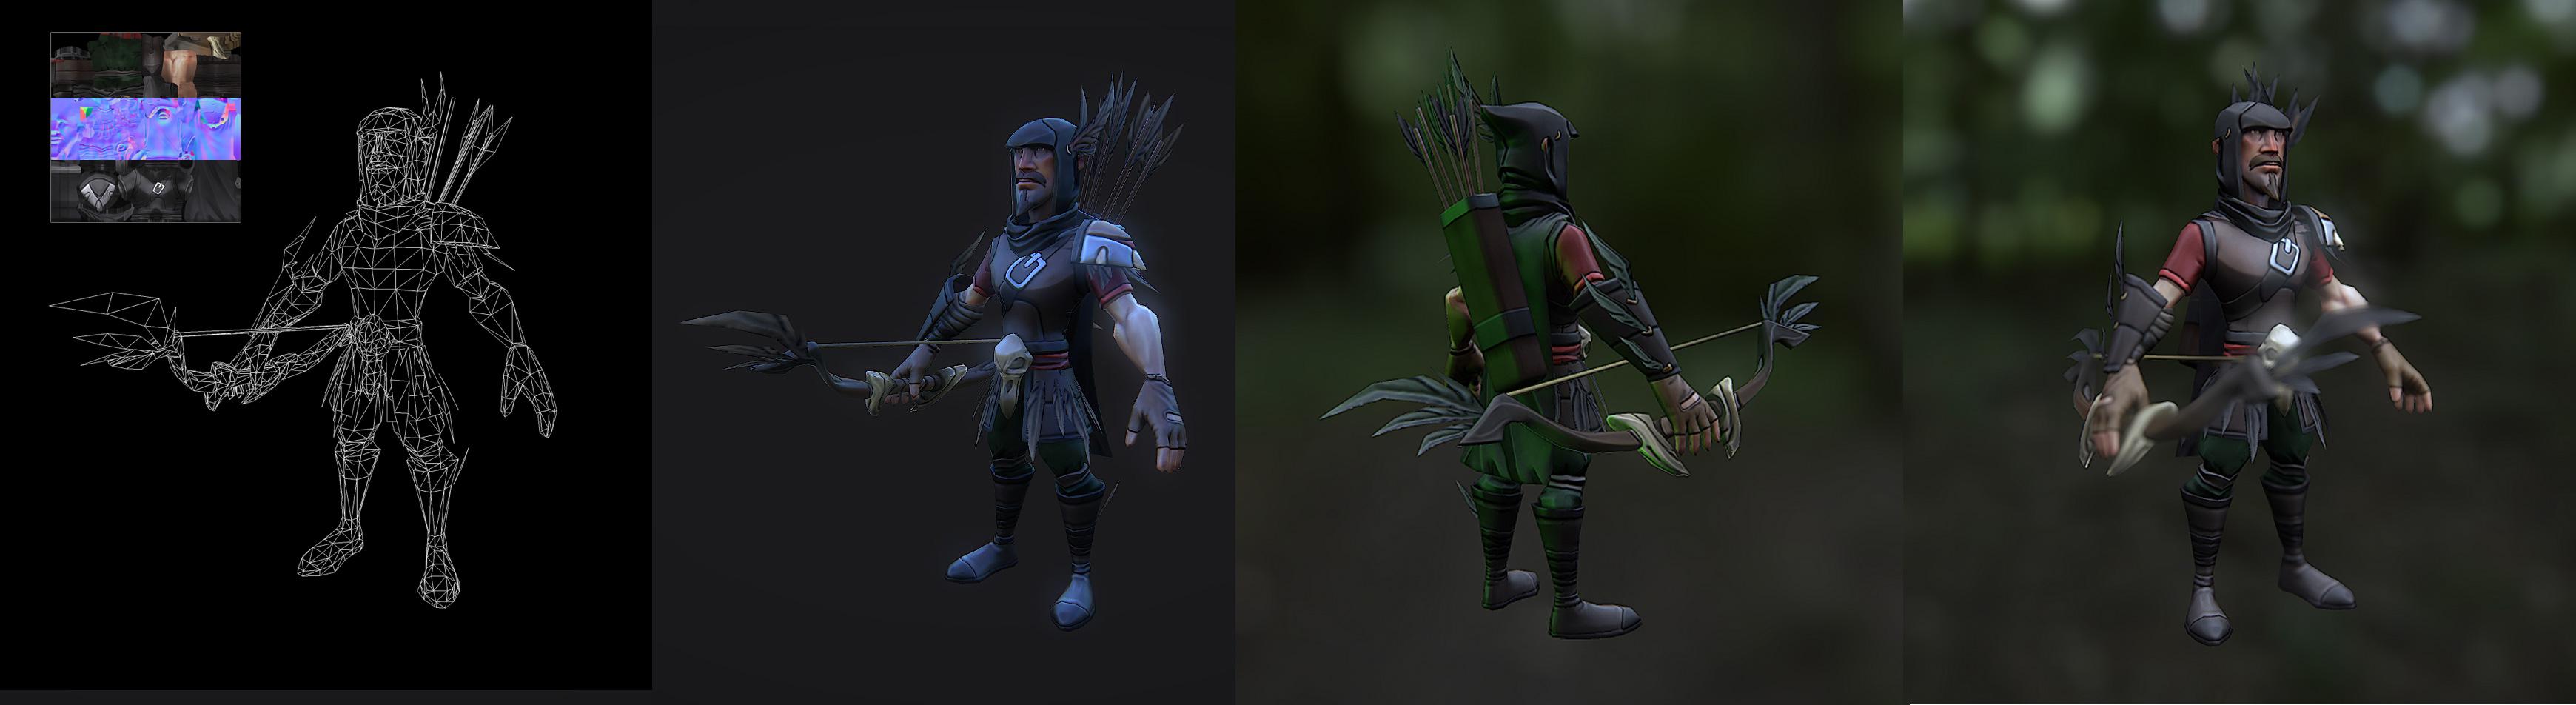 Ranger_Marmoset by pixelchaot